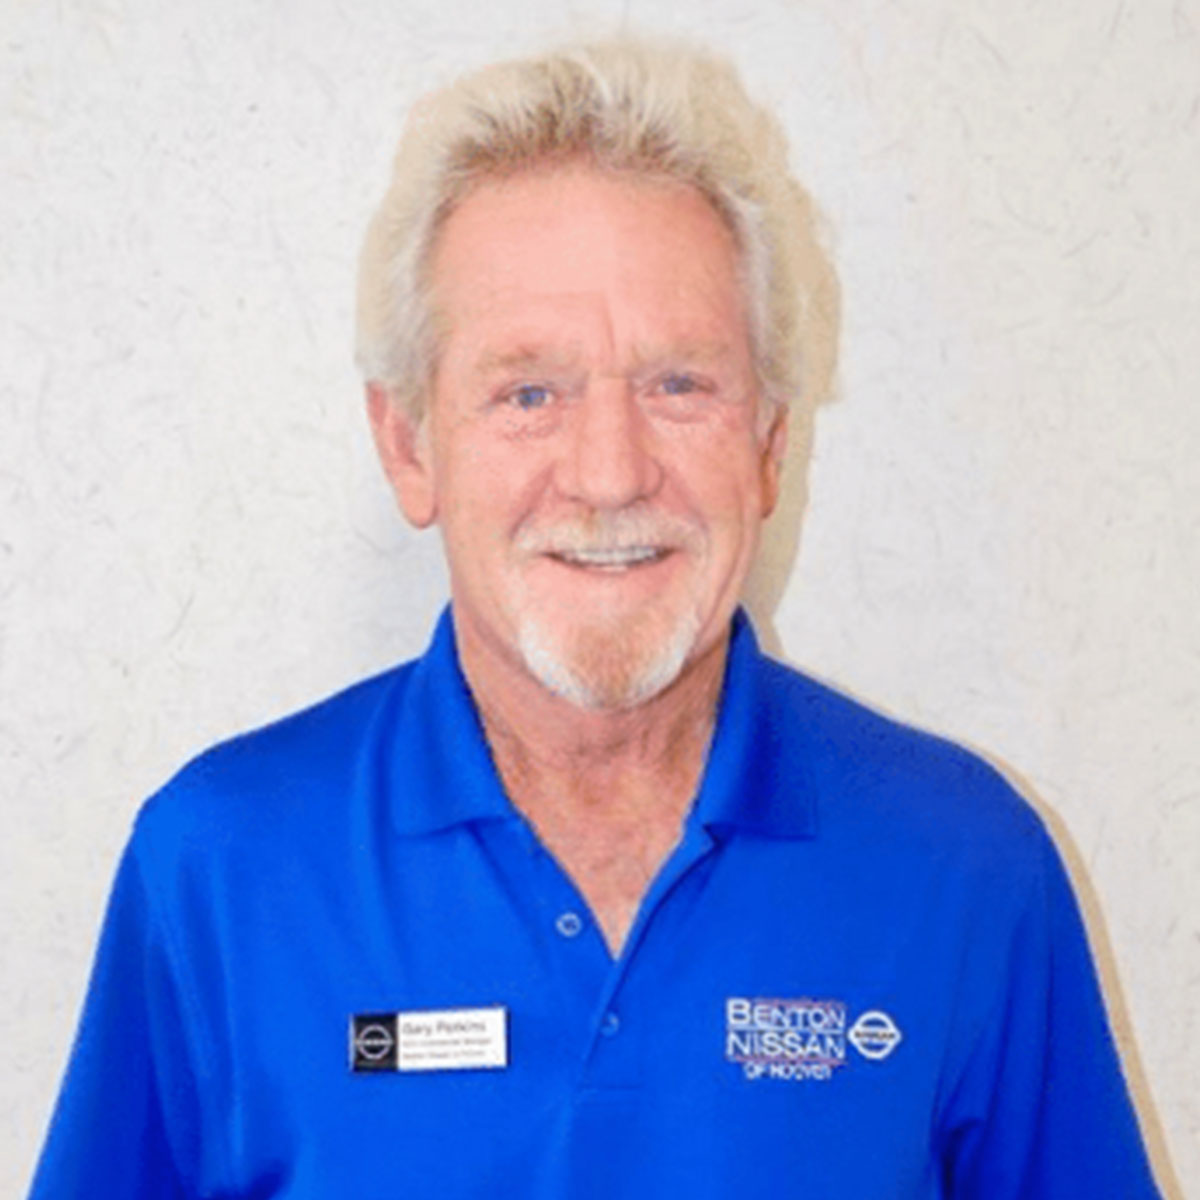 Gary Perkins Bio Image